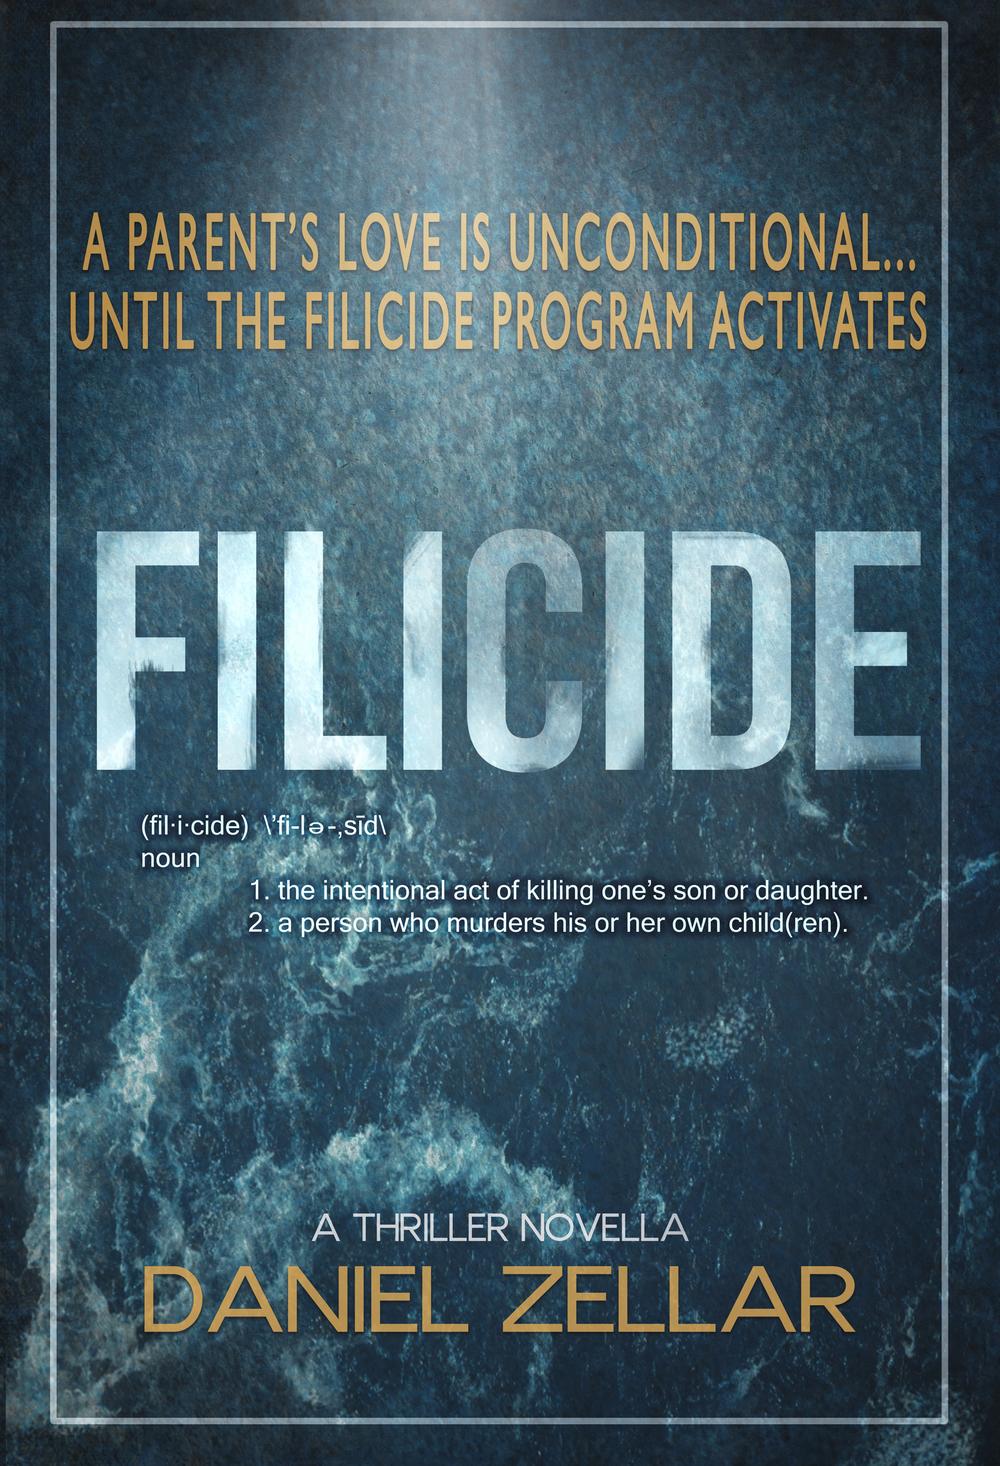 Filicide - Book Cover Artwork